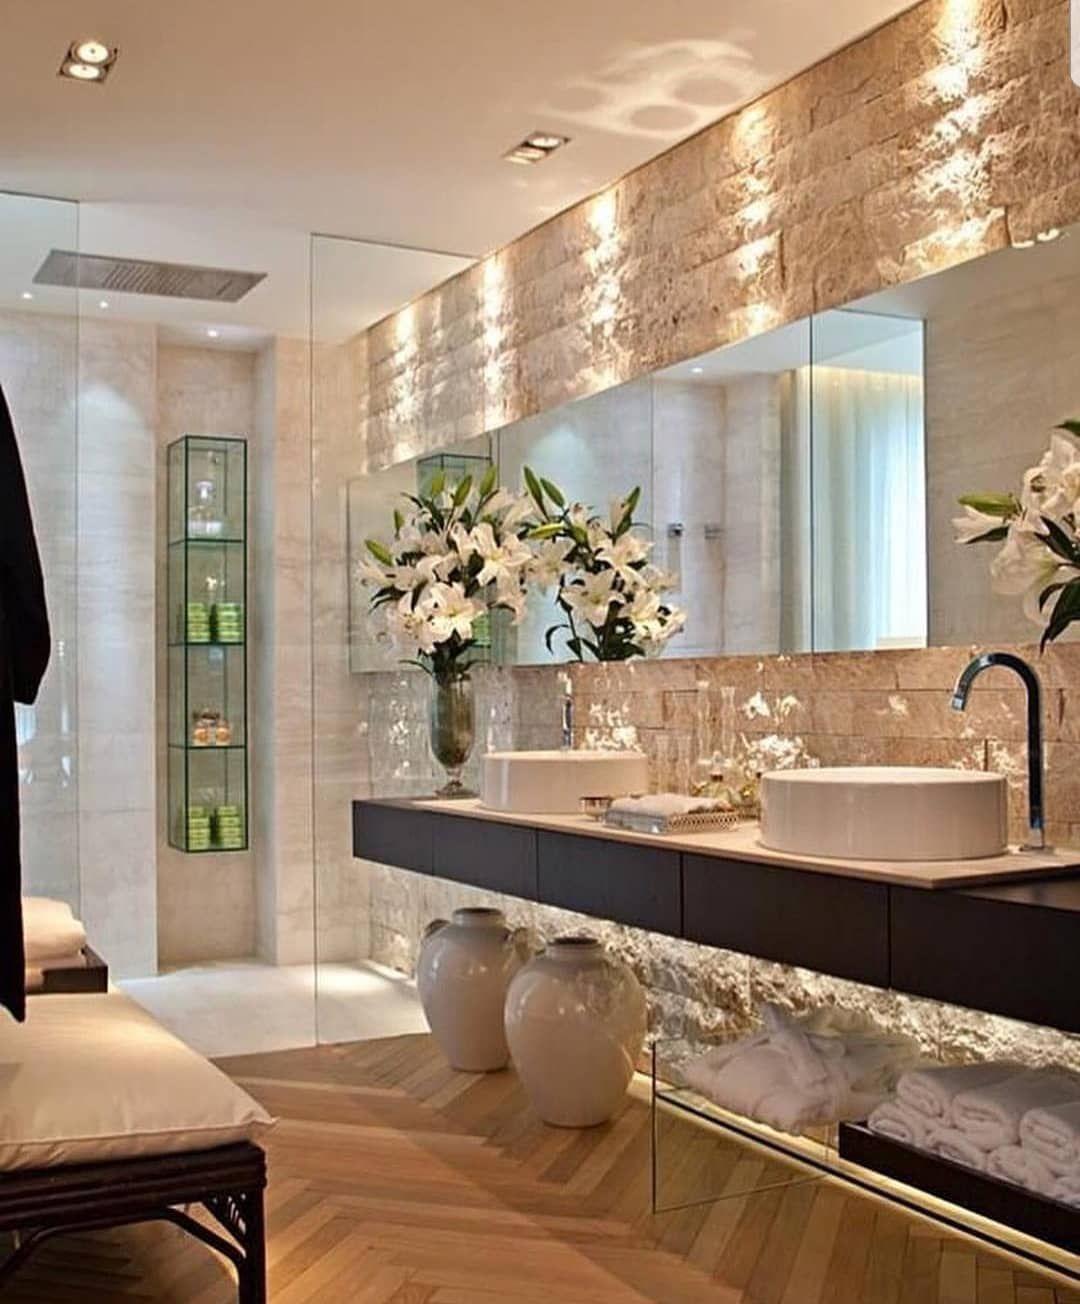 Tips For Easy Home Decorating In 2020 Modern Bathroom Design Beautiful Bathrooms Bathroom Interior Design